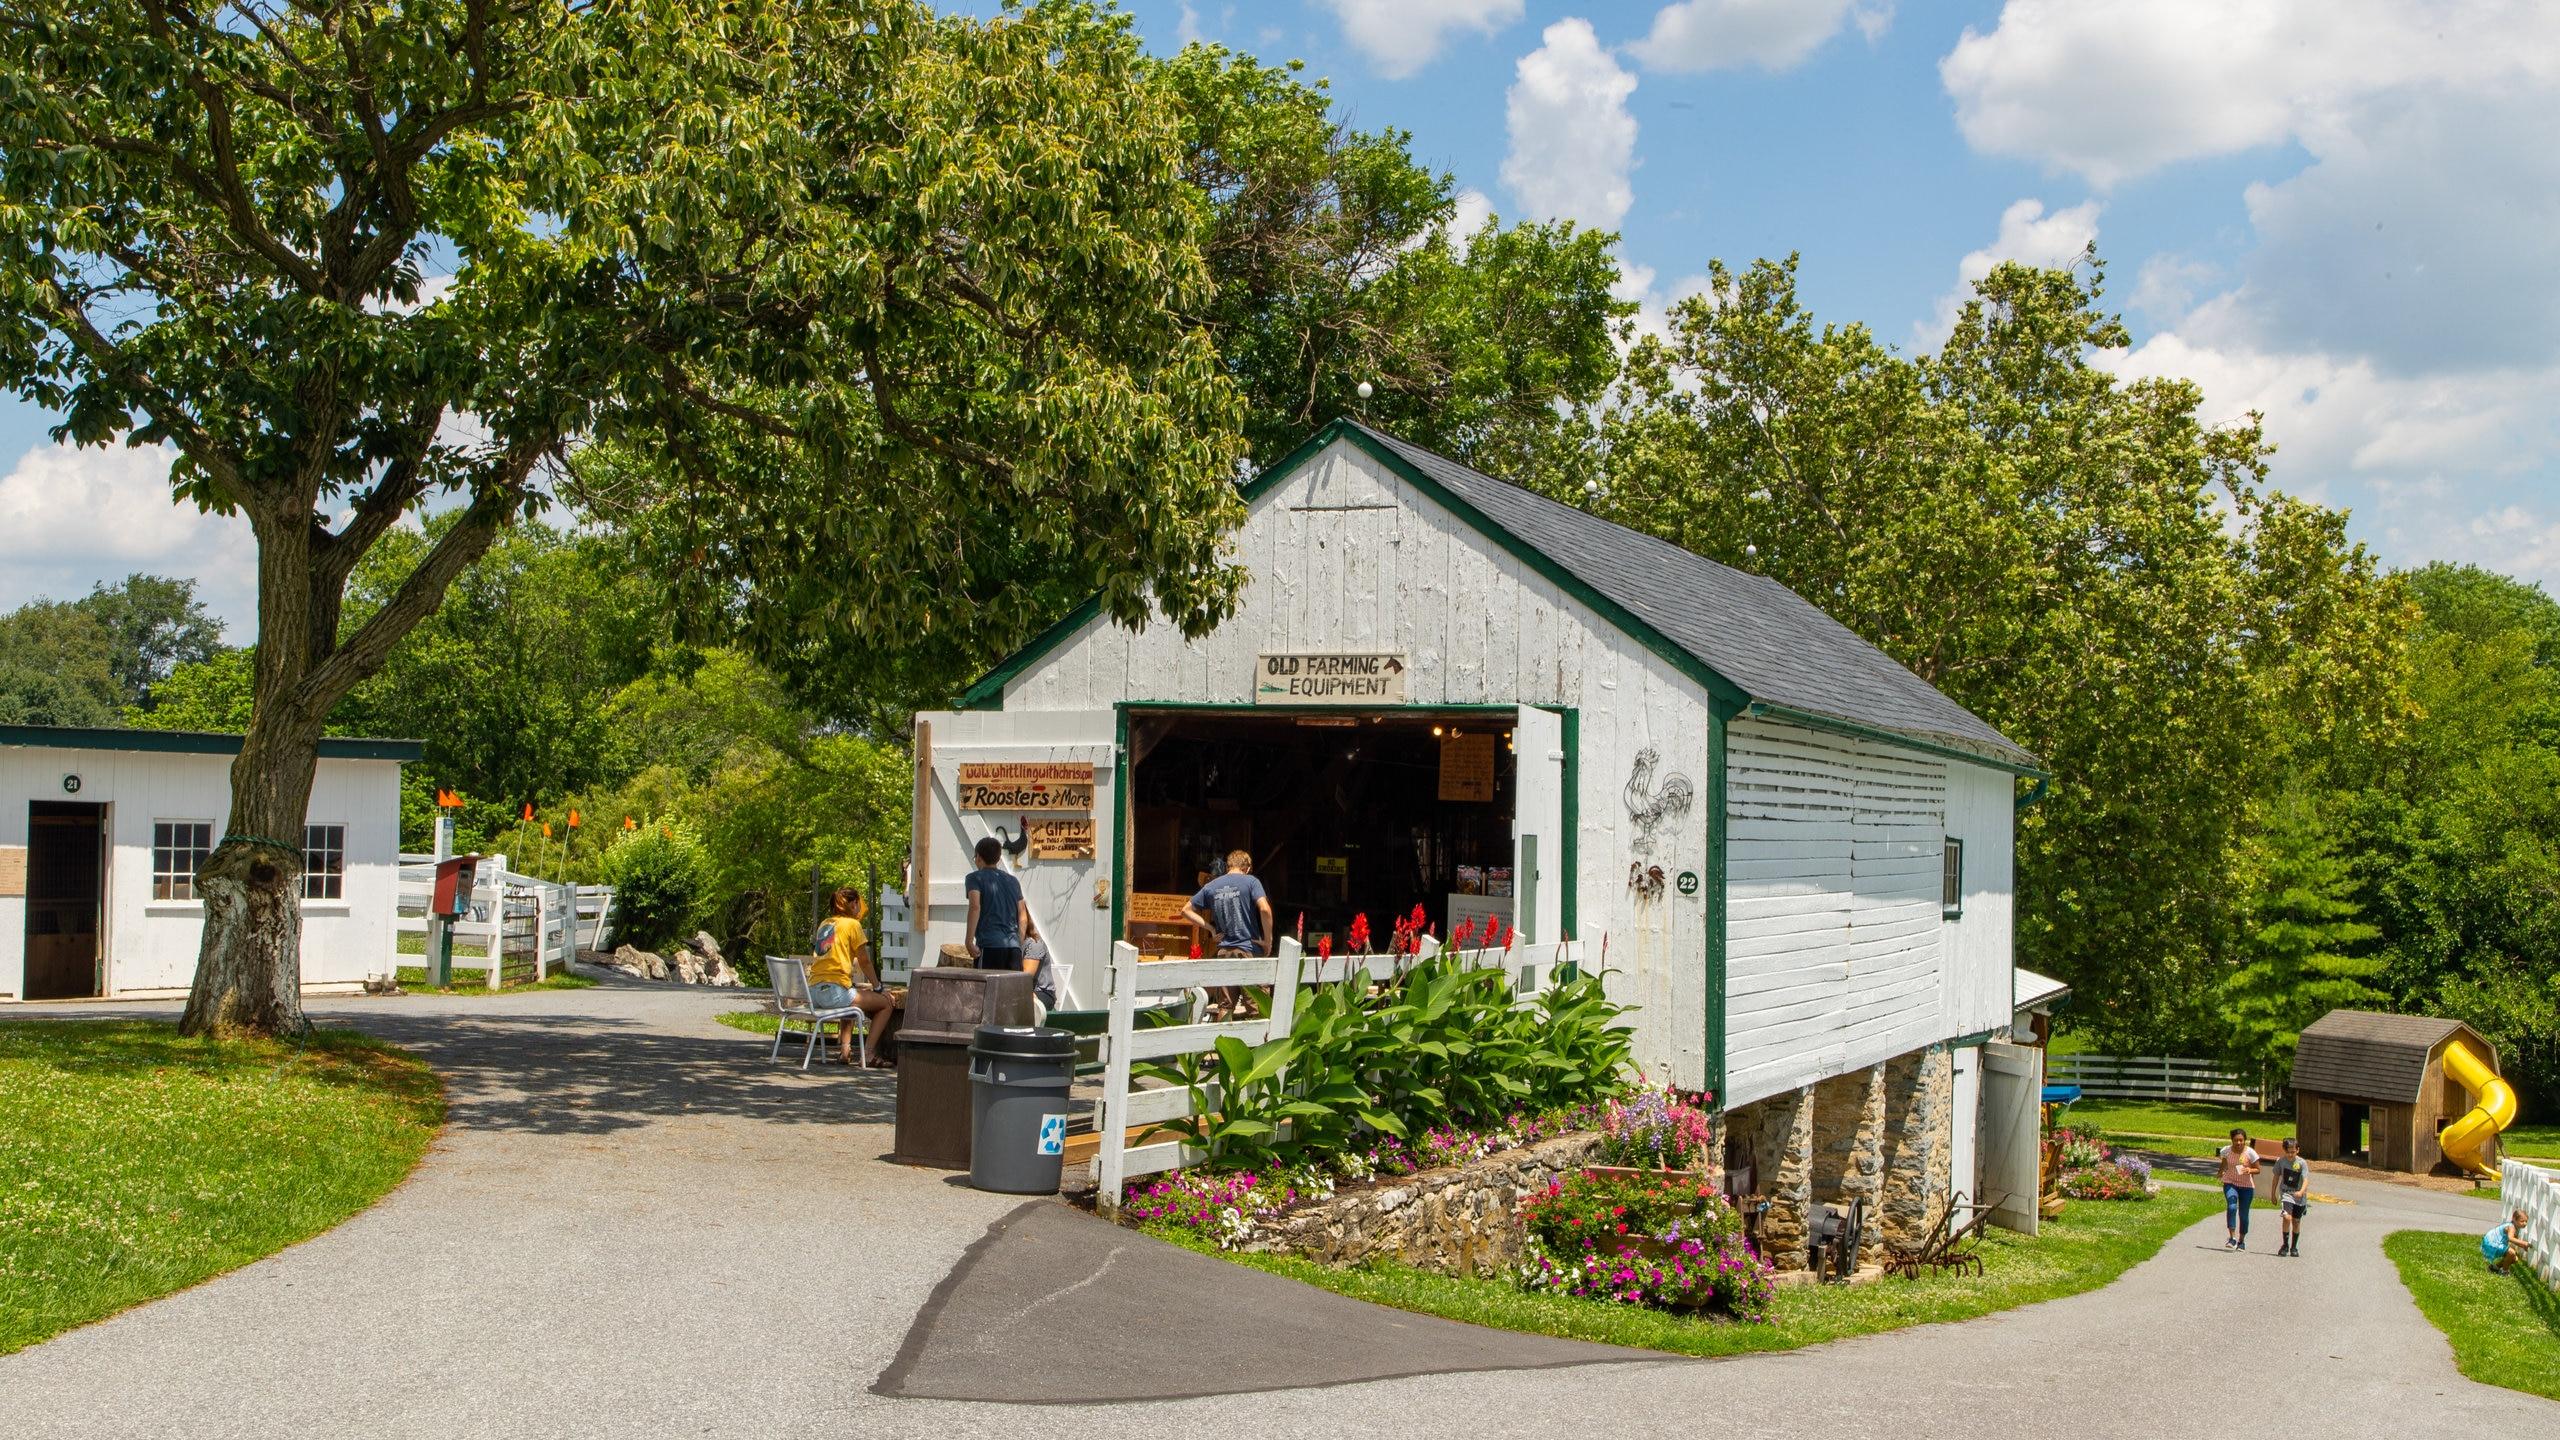 Amish Farm and House, Lancaster, Pennsylvania, United States of America